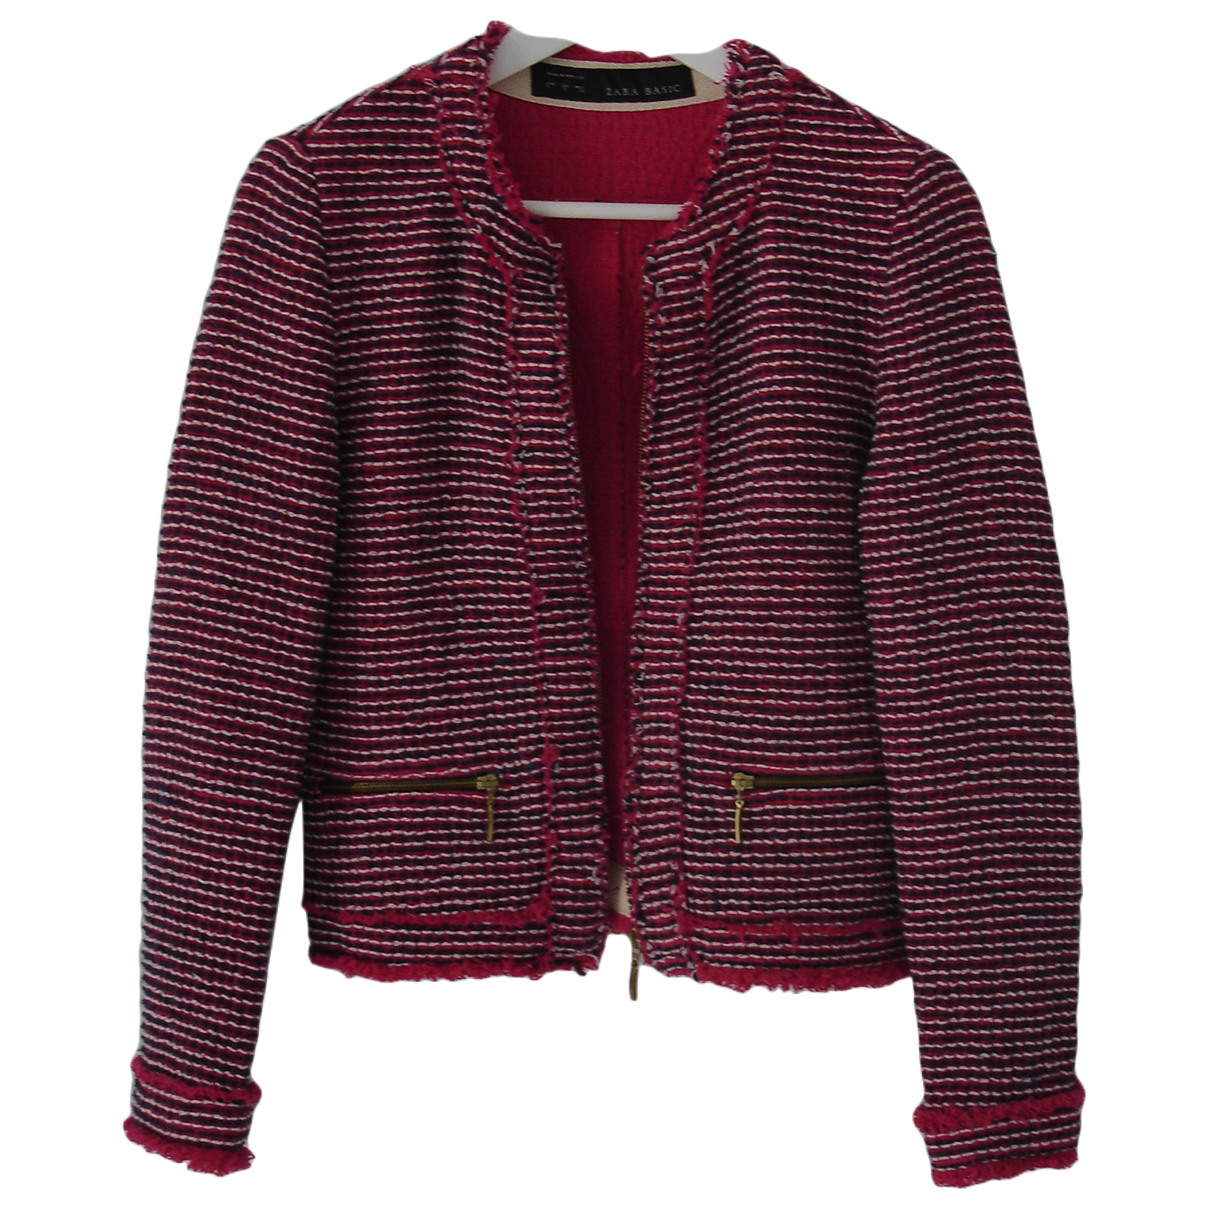 Zara \N Pink Cotton coat for Women S International